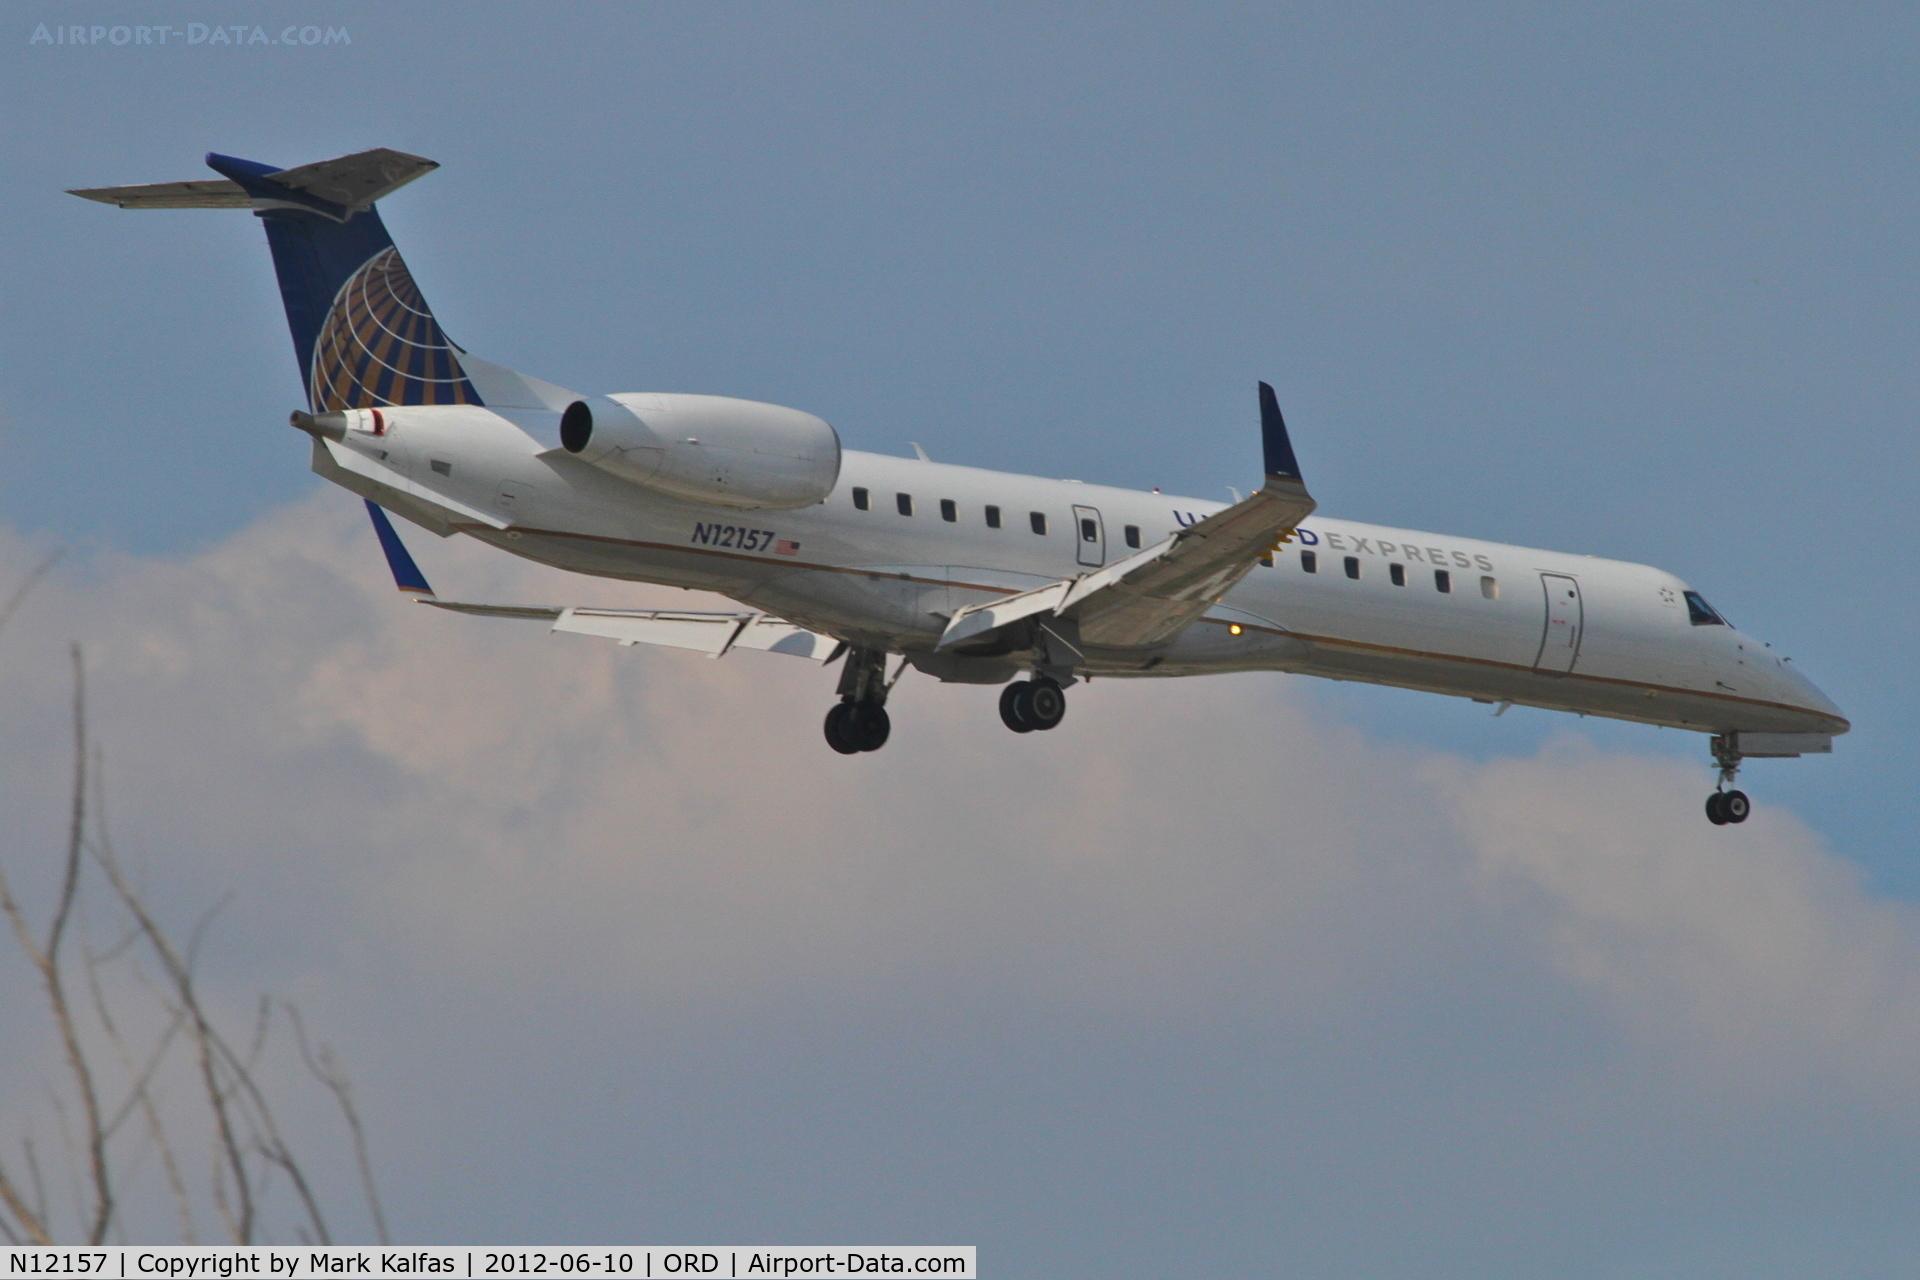 N12157, 2004 Embraer EMB-145XR C/N 145787, ExpressJet Airlines/United Express Embraer EMB-145XR, ASQ1621 arriving from Quad City Int'l /KMLI, RWY 10 approach KORD.